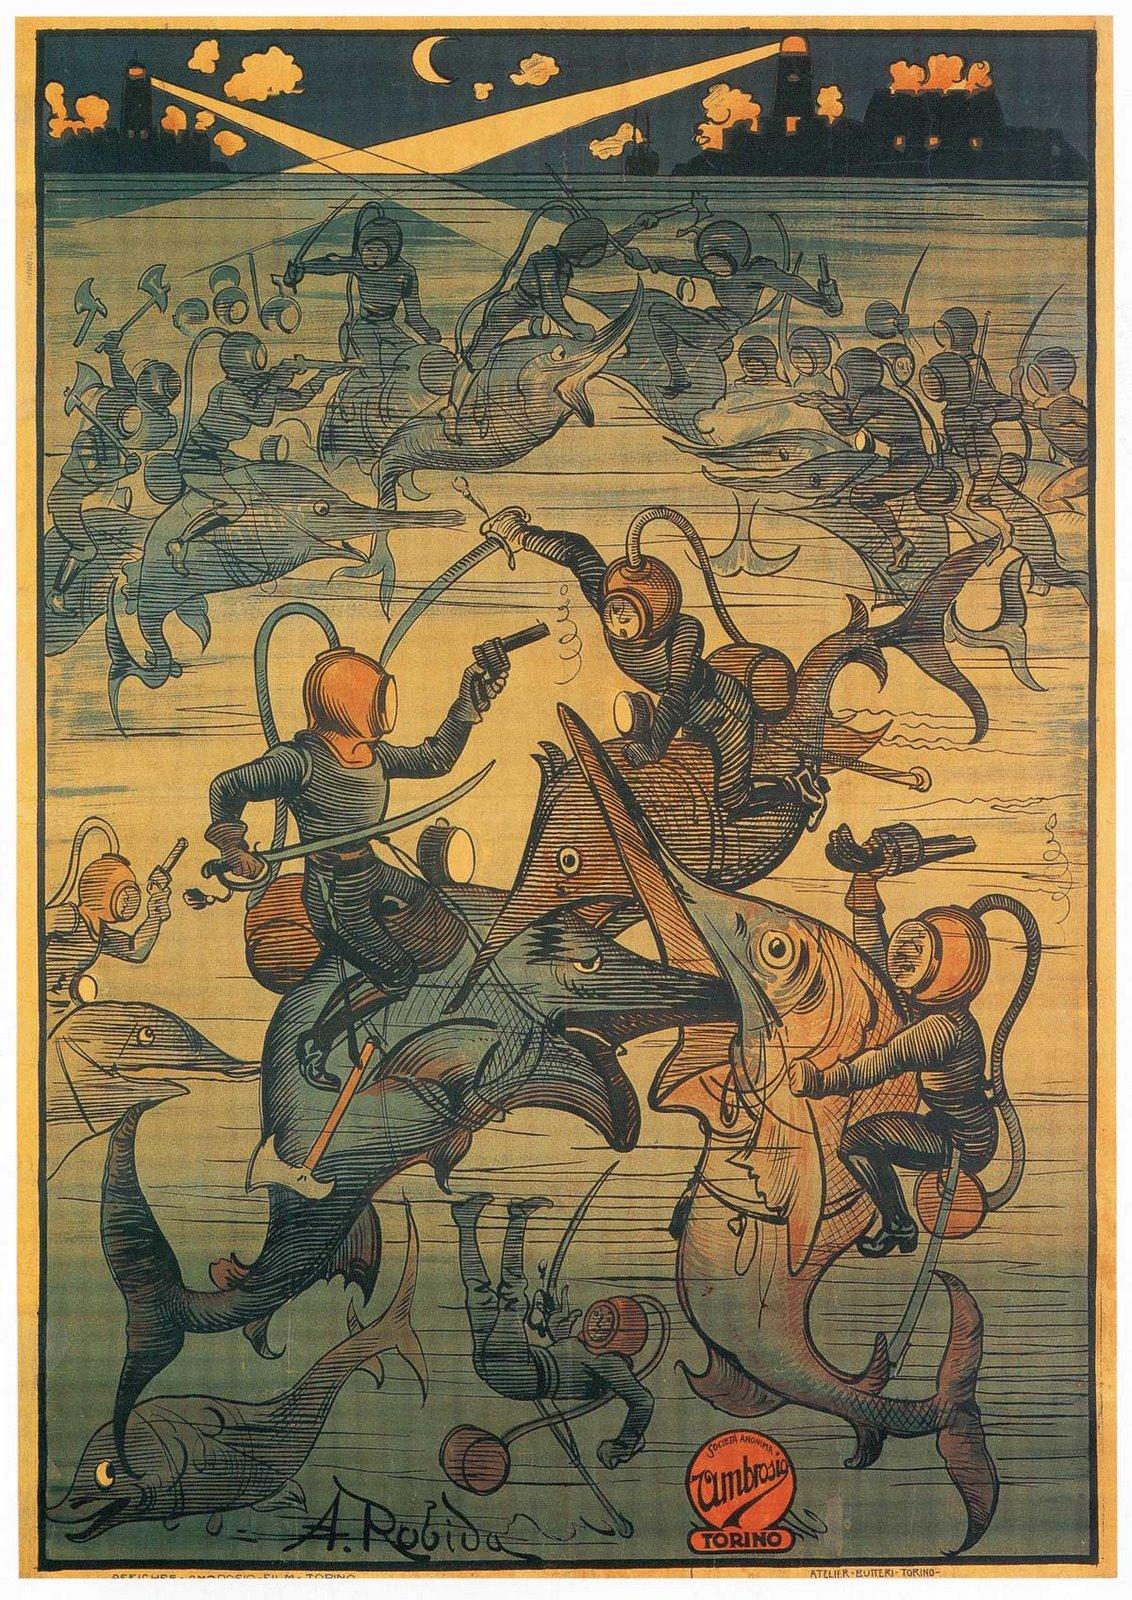 1914---L'Avventure-Straordi.jpg